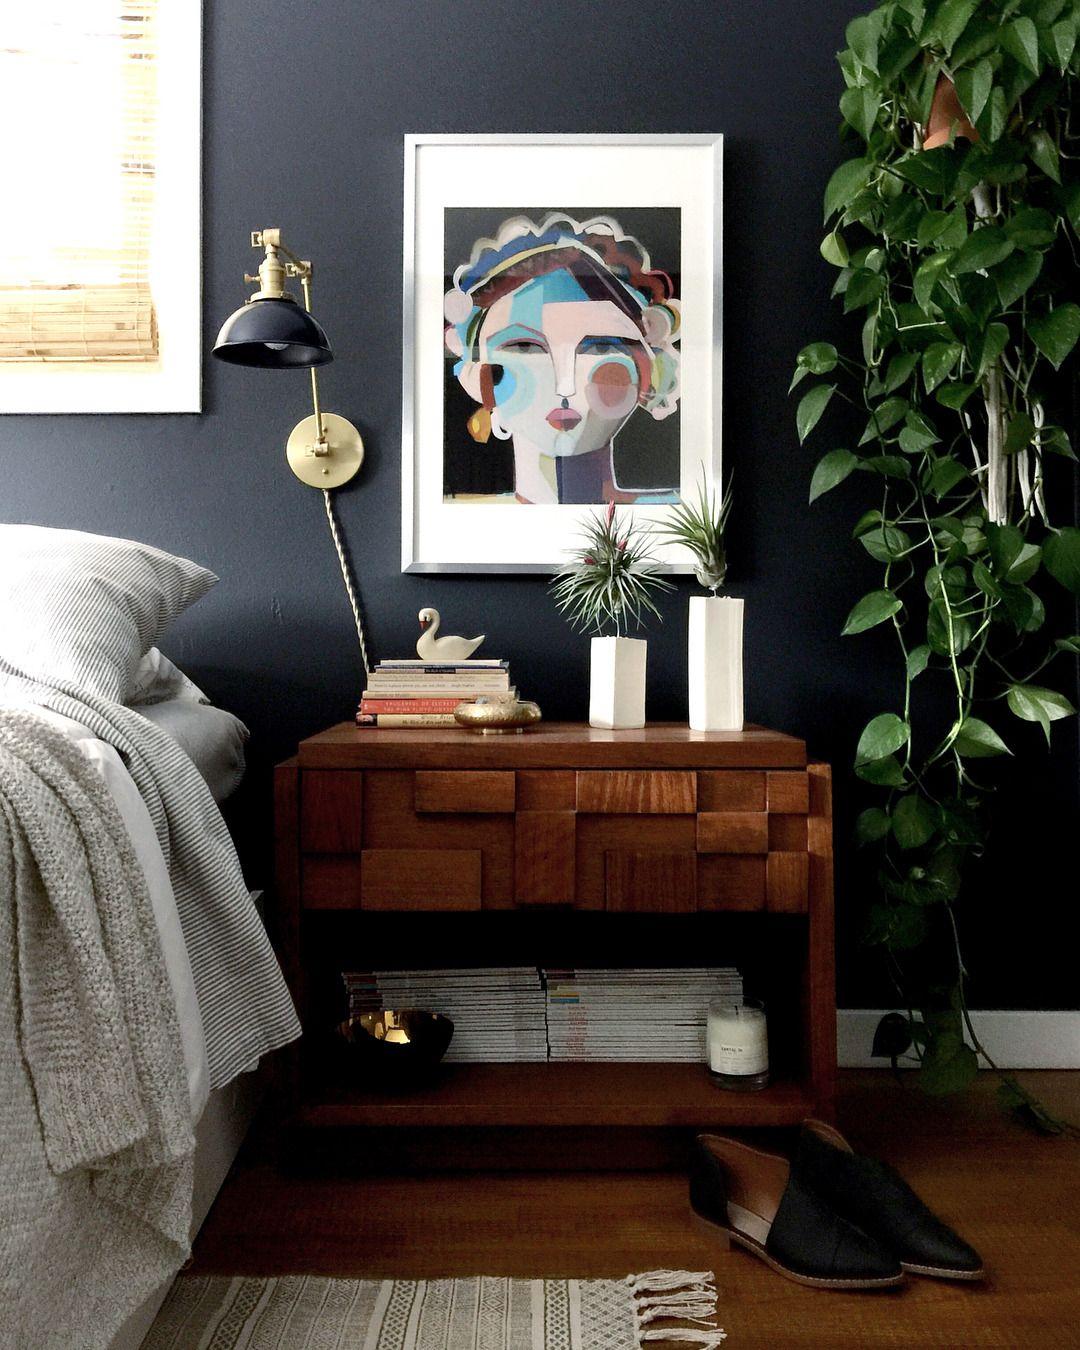 Sabonhomeblog also interior dec pinterest home bedroom and decor rh